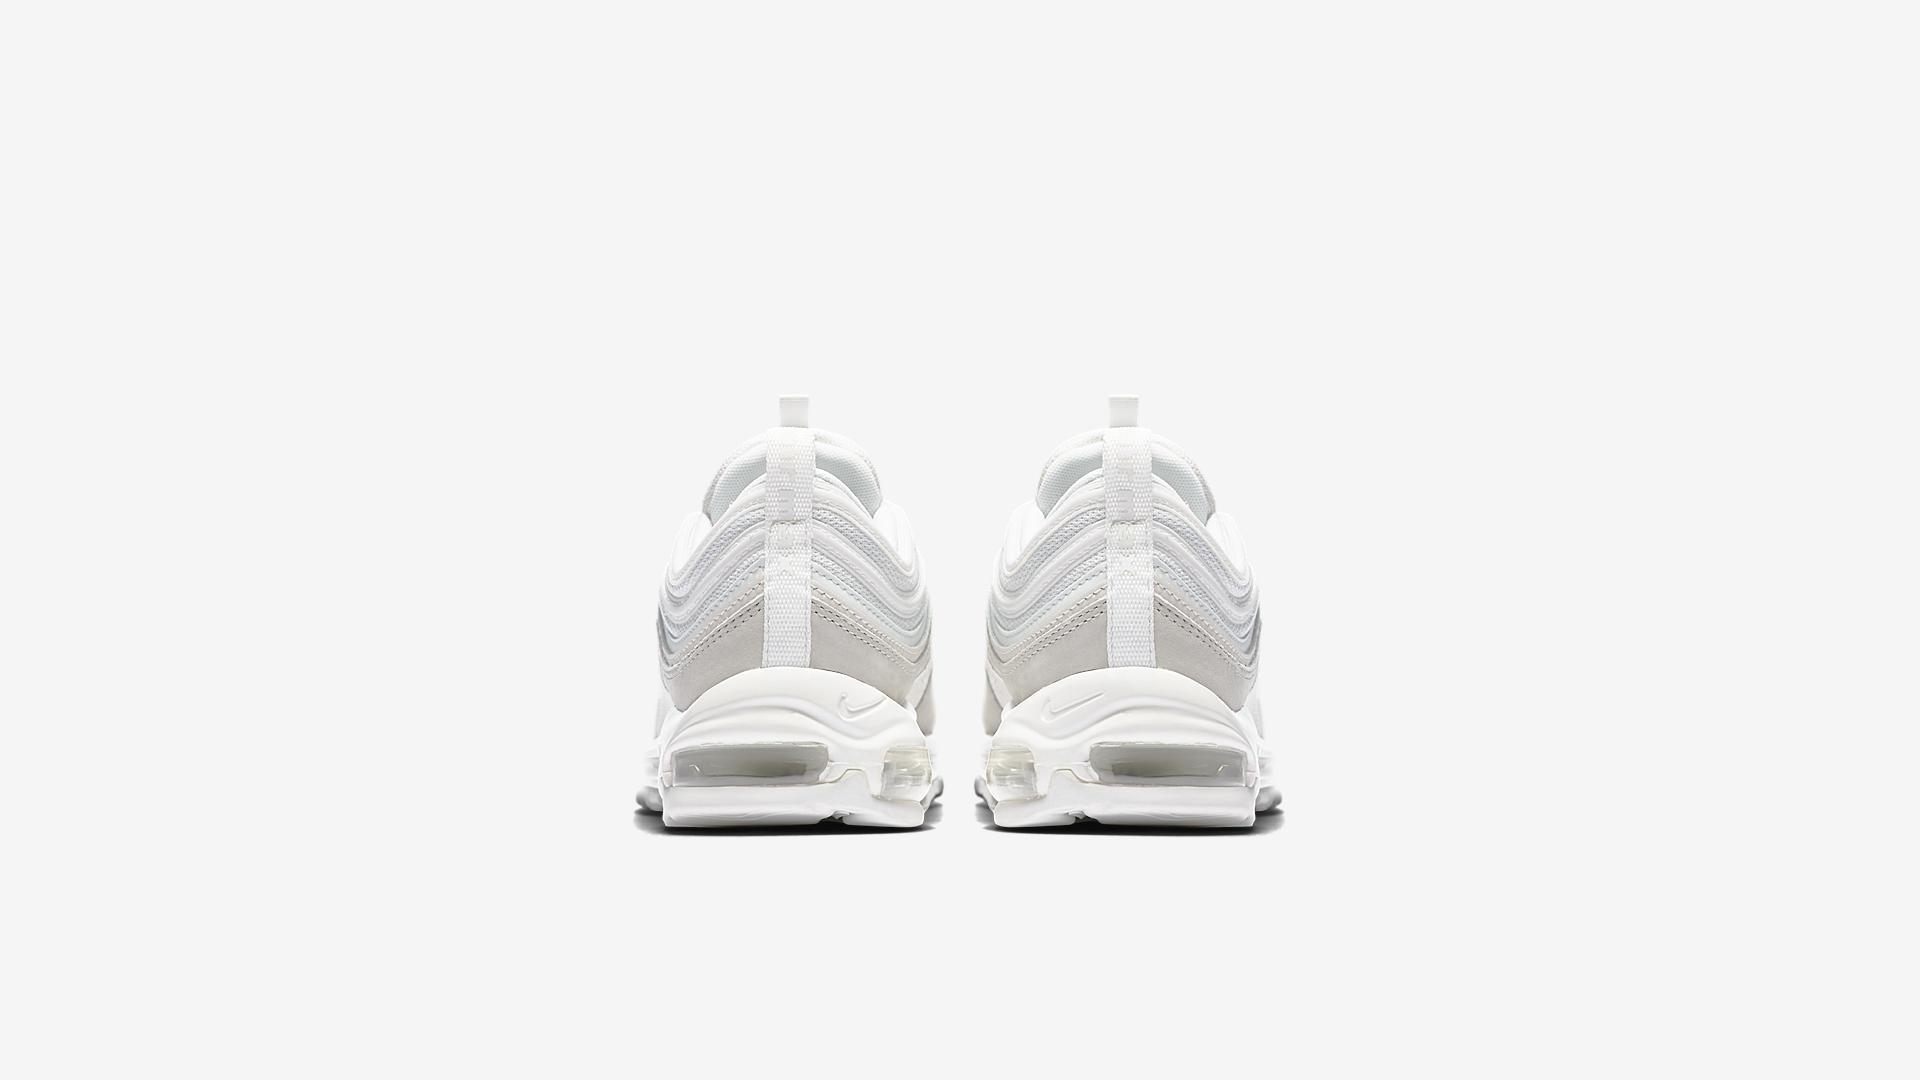 312834 006 Nike Air Max 97 PRM Light Bone 2